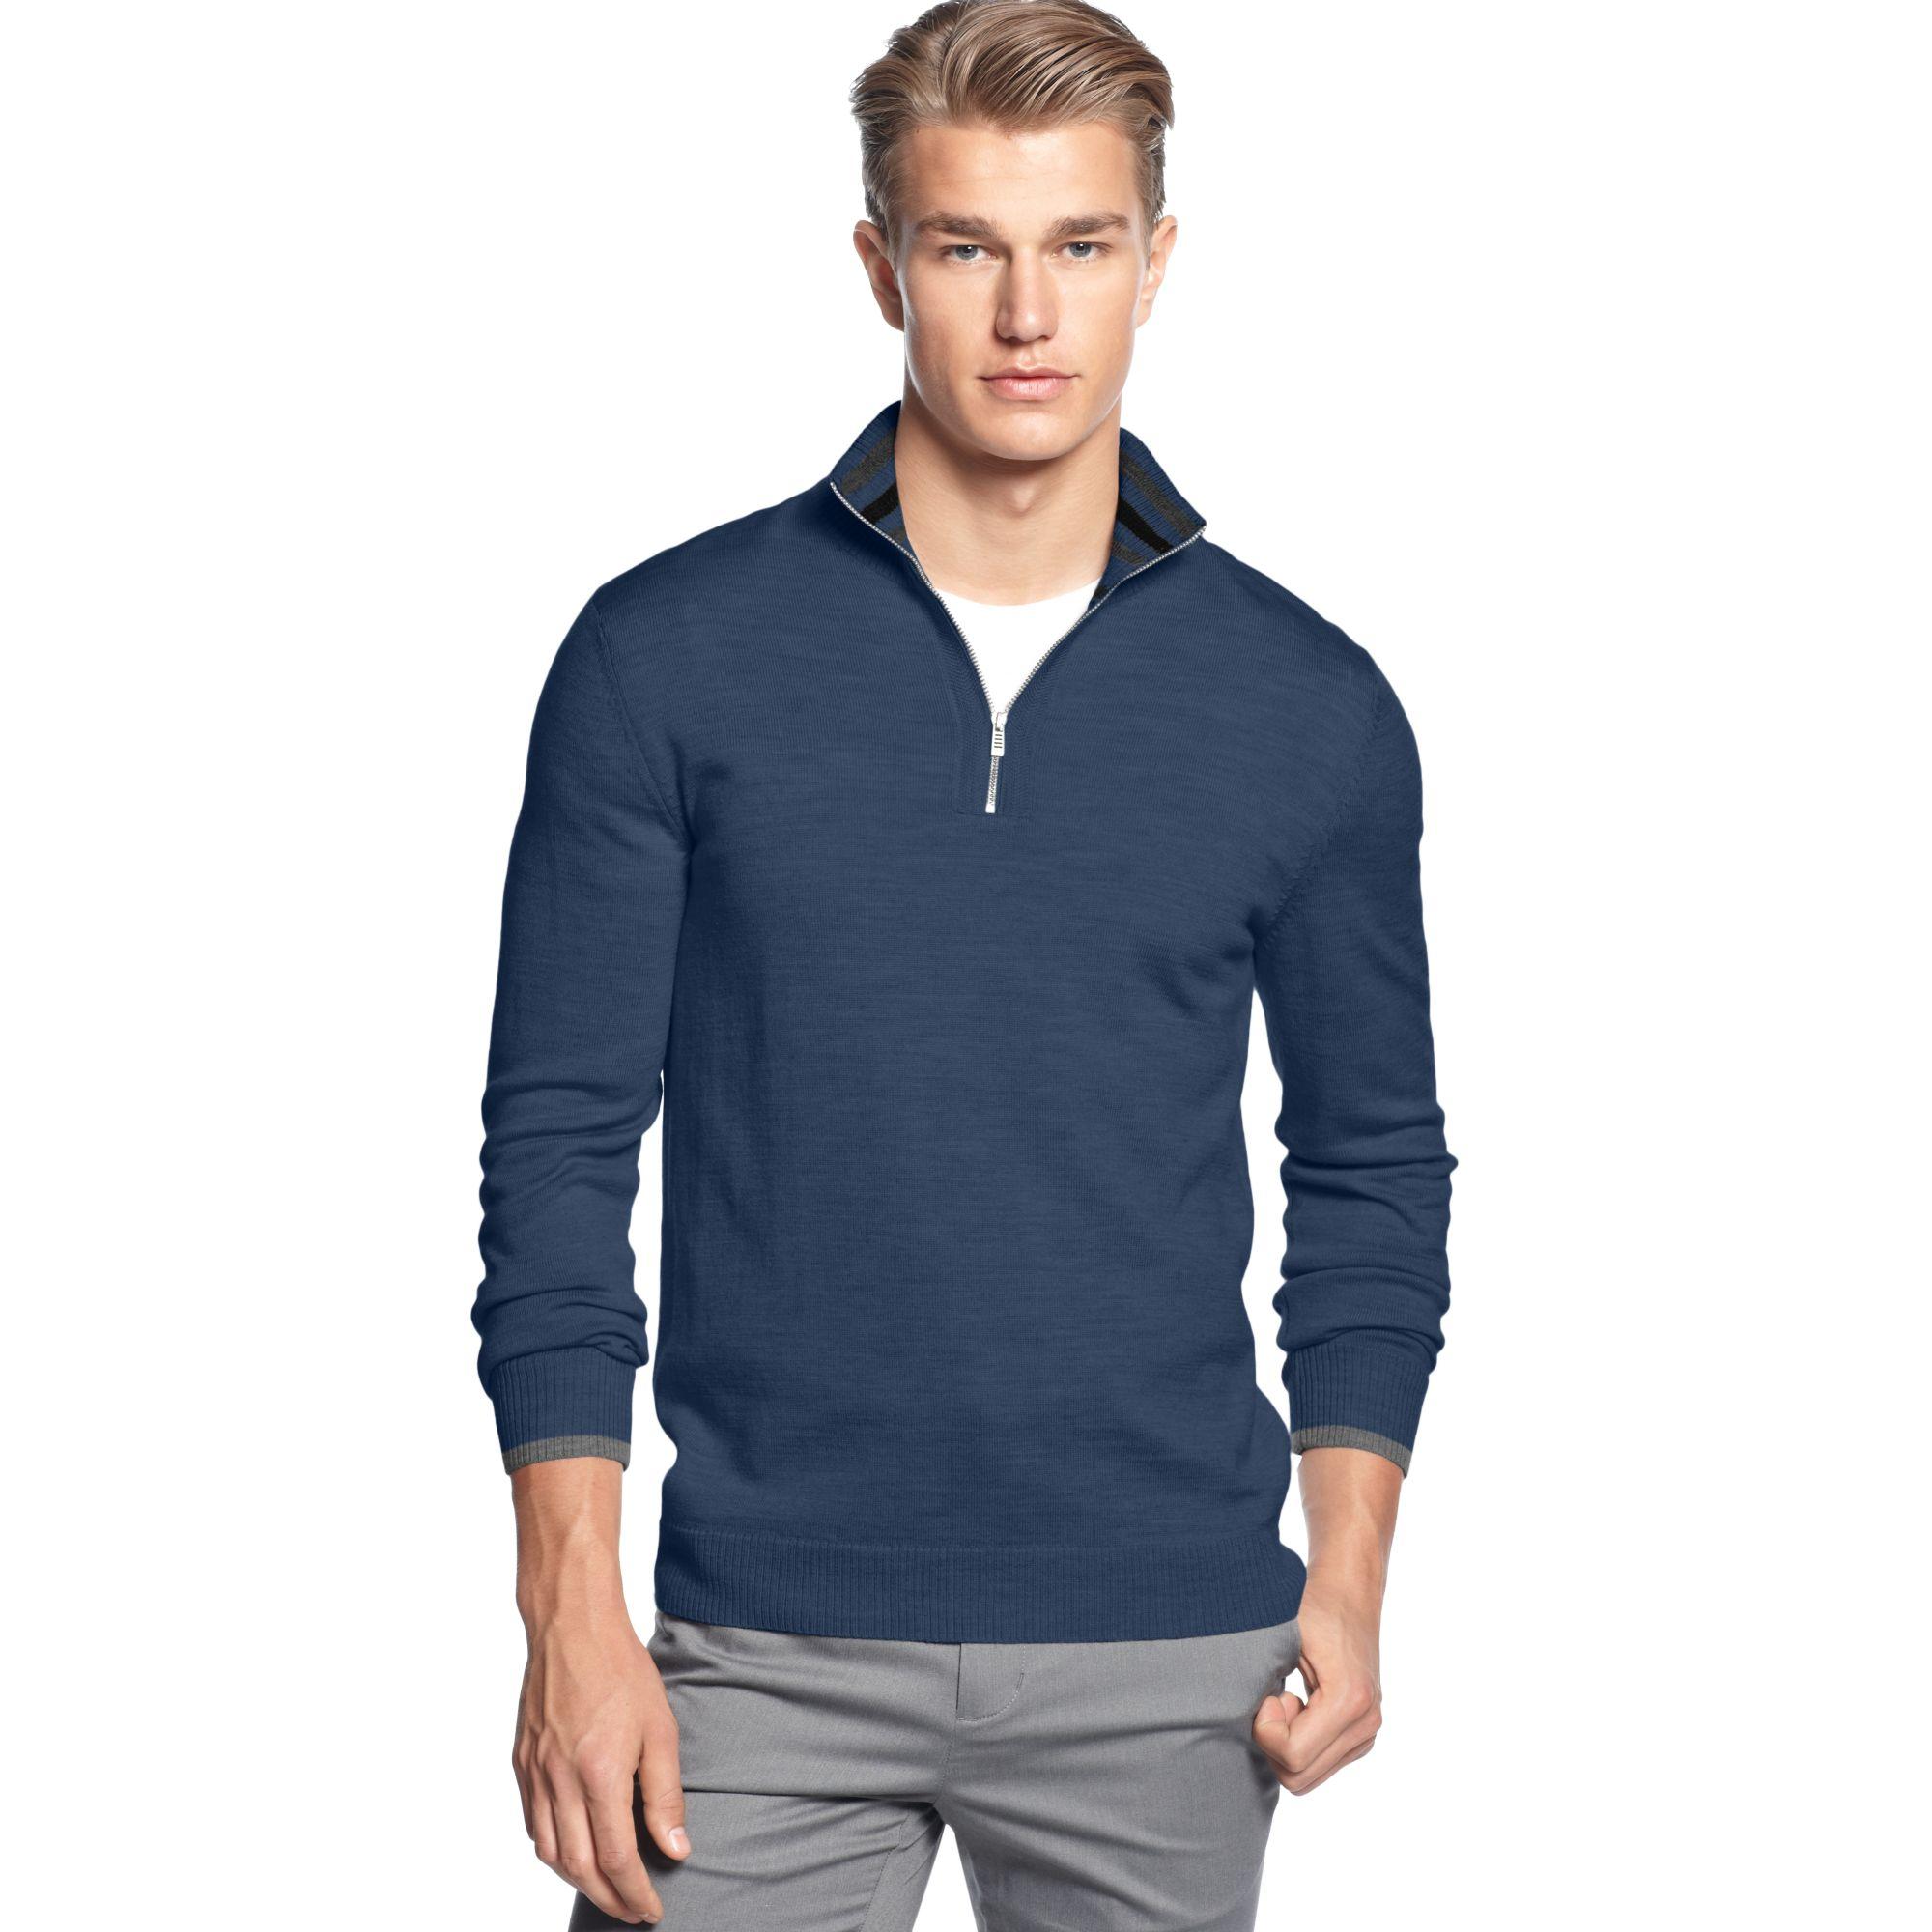 lyst calvin klein quarter zipper merino mock sweater in. Black Bedroom Furniture Sets. Home Design Ideas